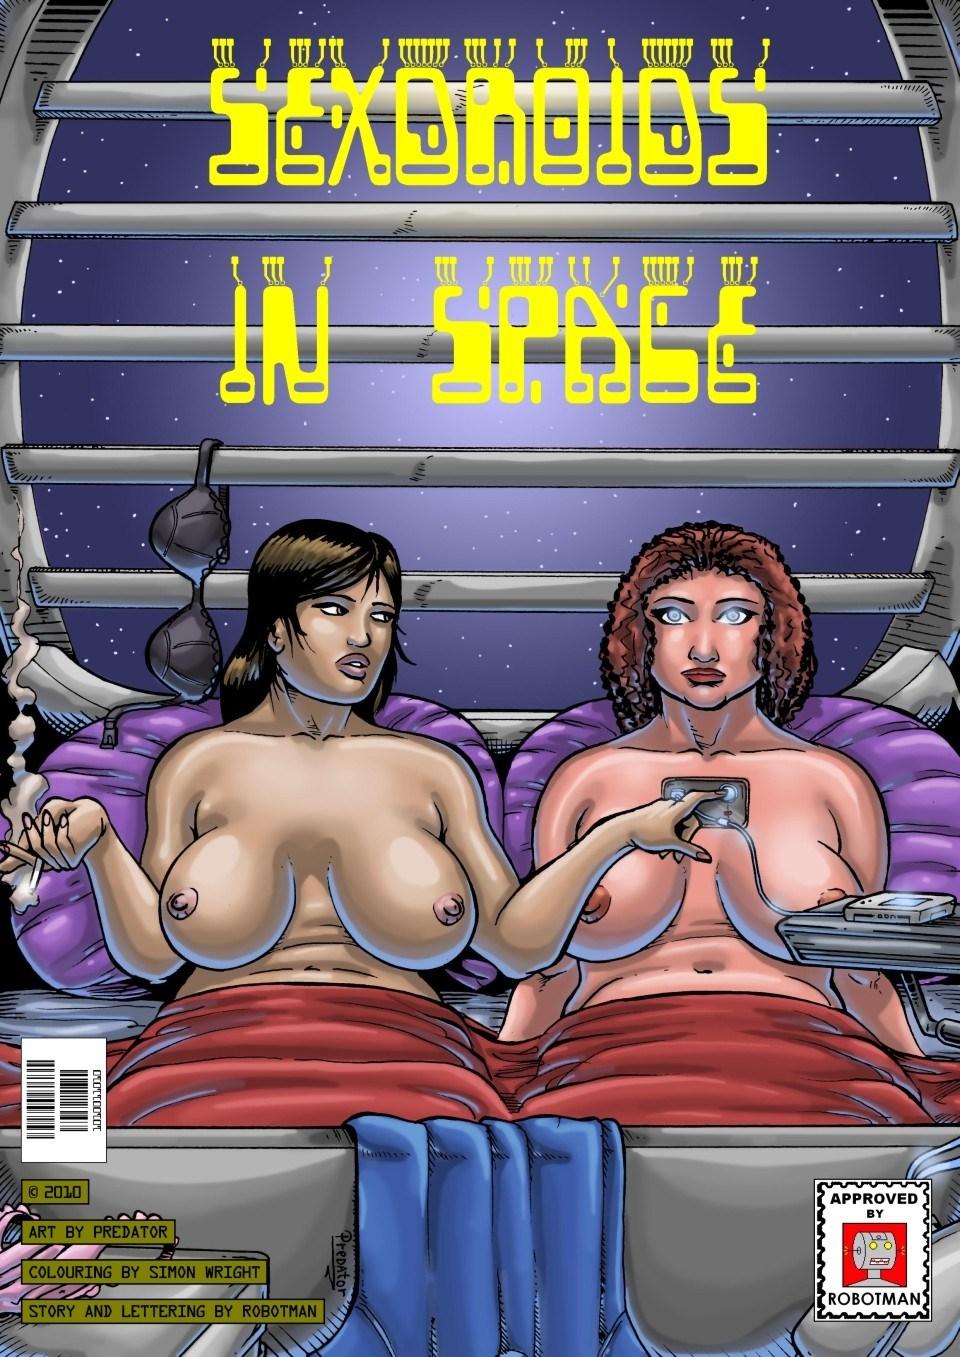 Porn Comics - Sex Droids in Space-Predator porn comics 8 muses